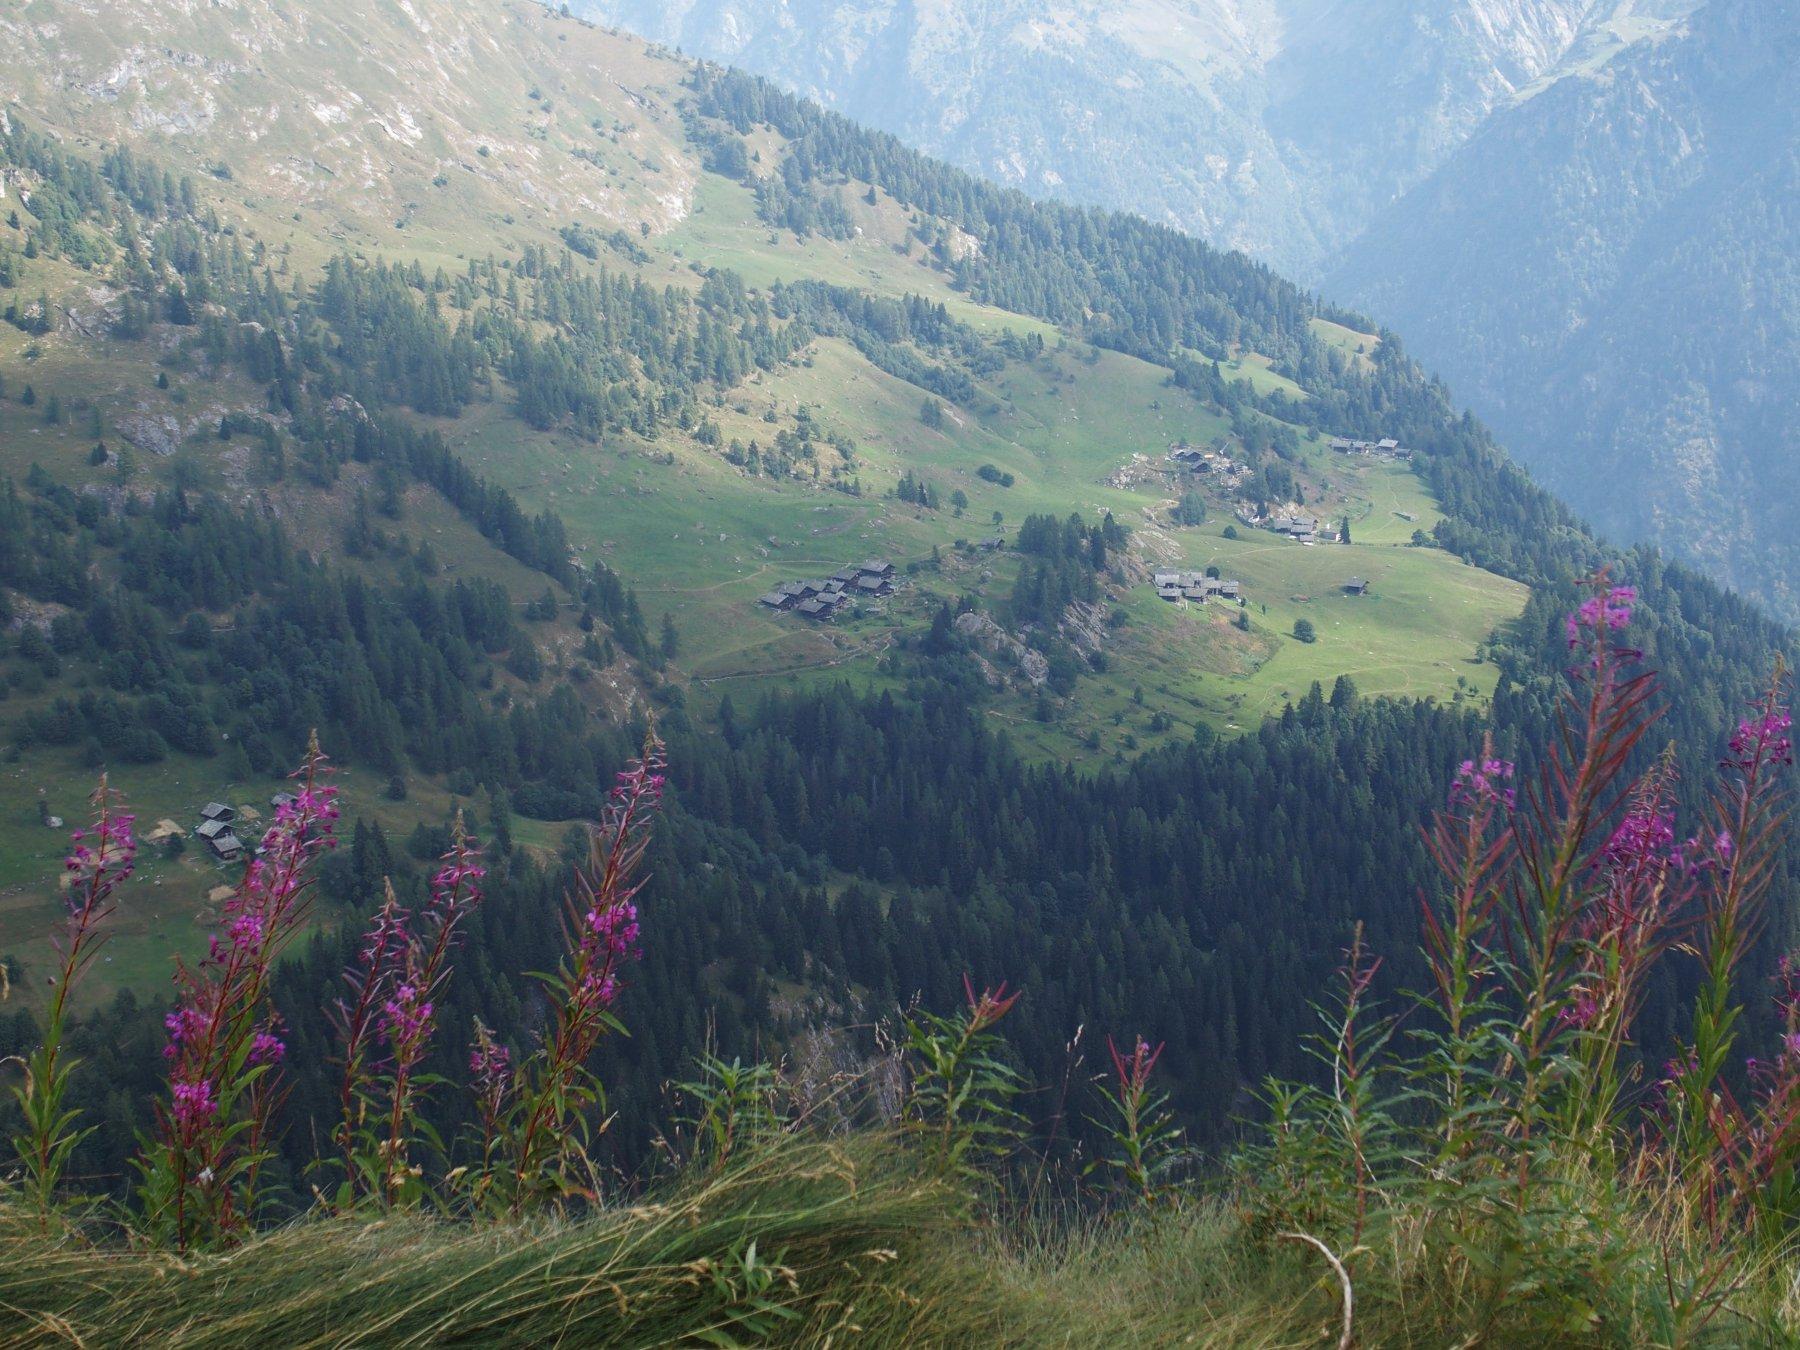 Vista sulla Val d'Otro ed i villaggi Walser dall'Alpe Tailly